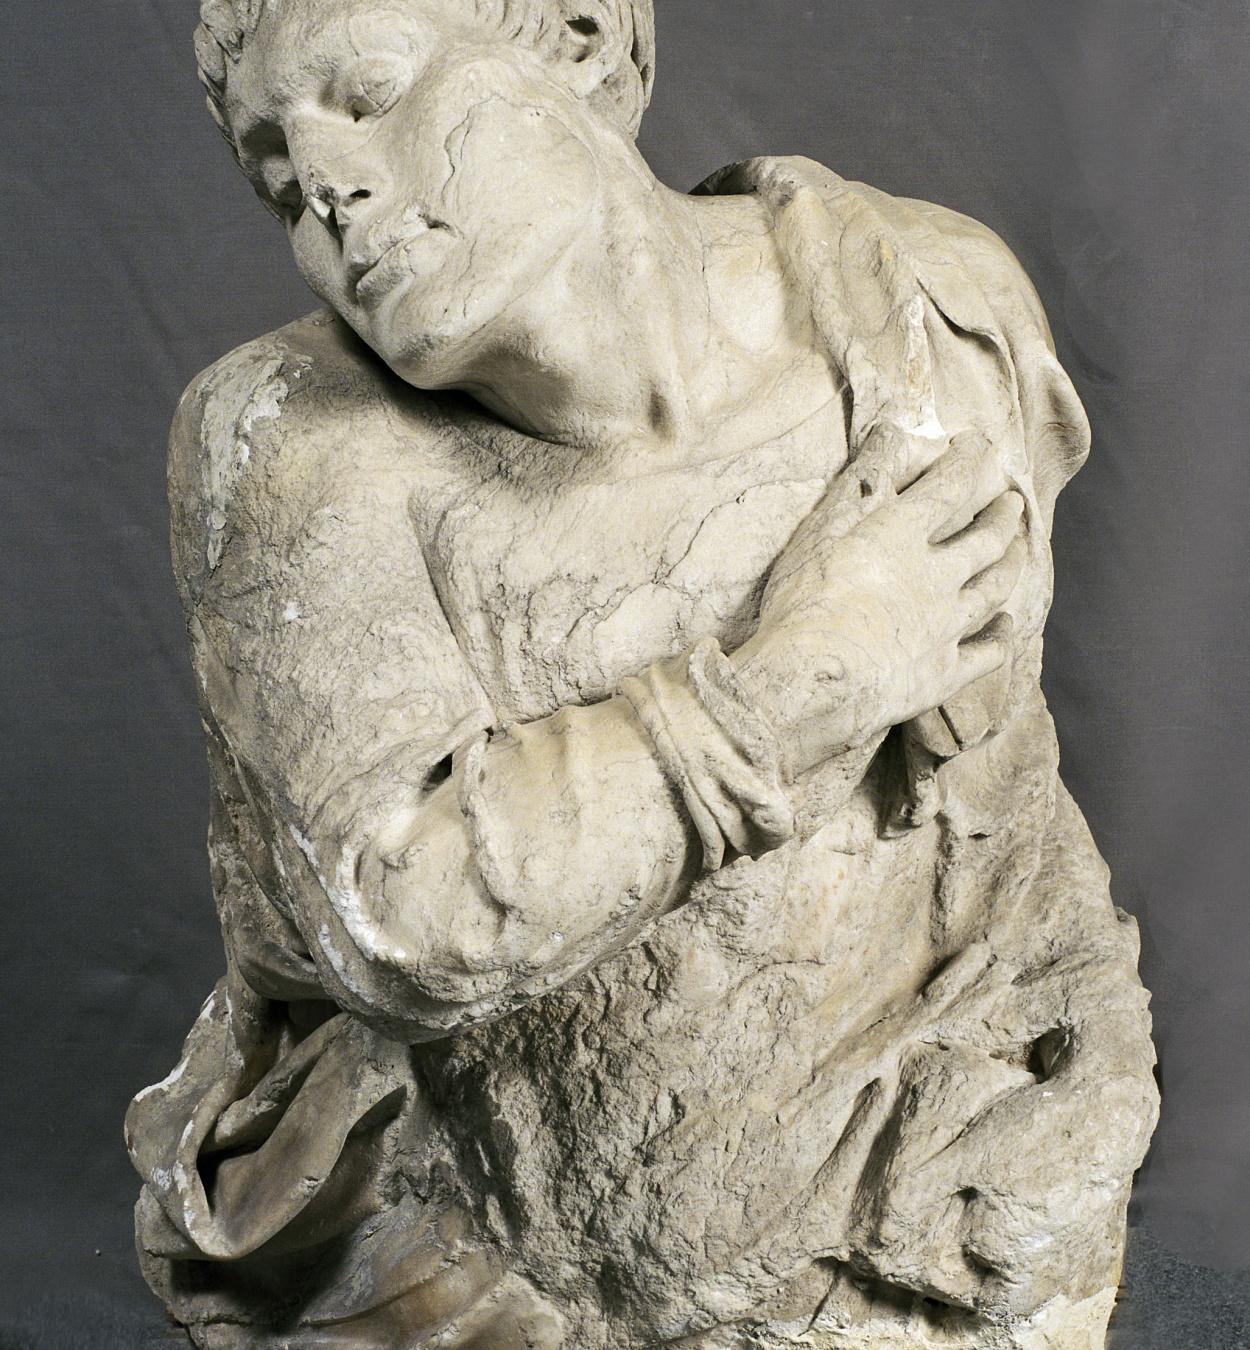 Damià Forment - Dormition of the Virgin: Apostle - 1534-1537